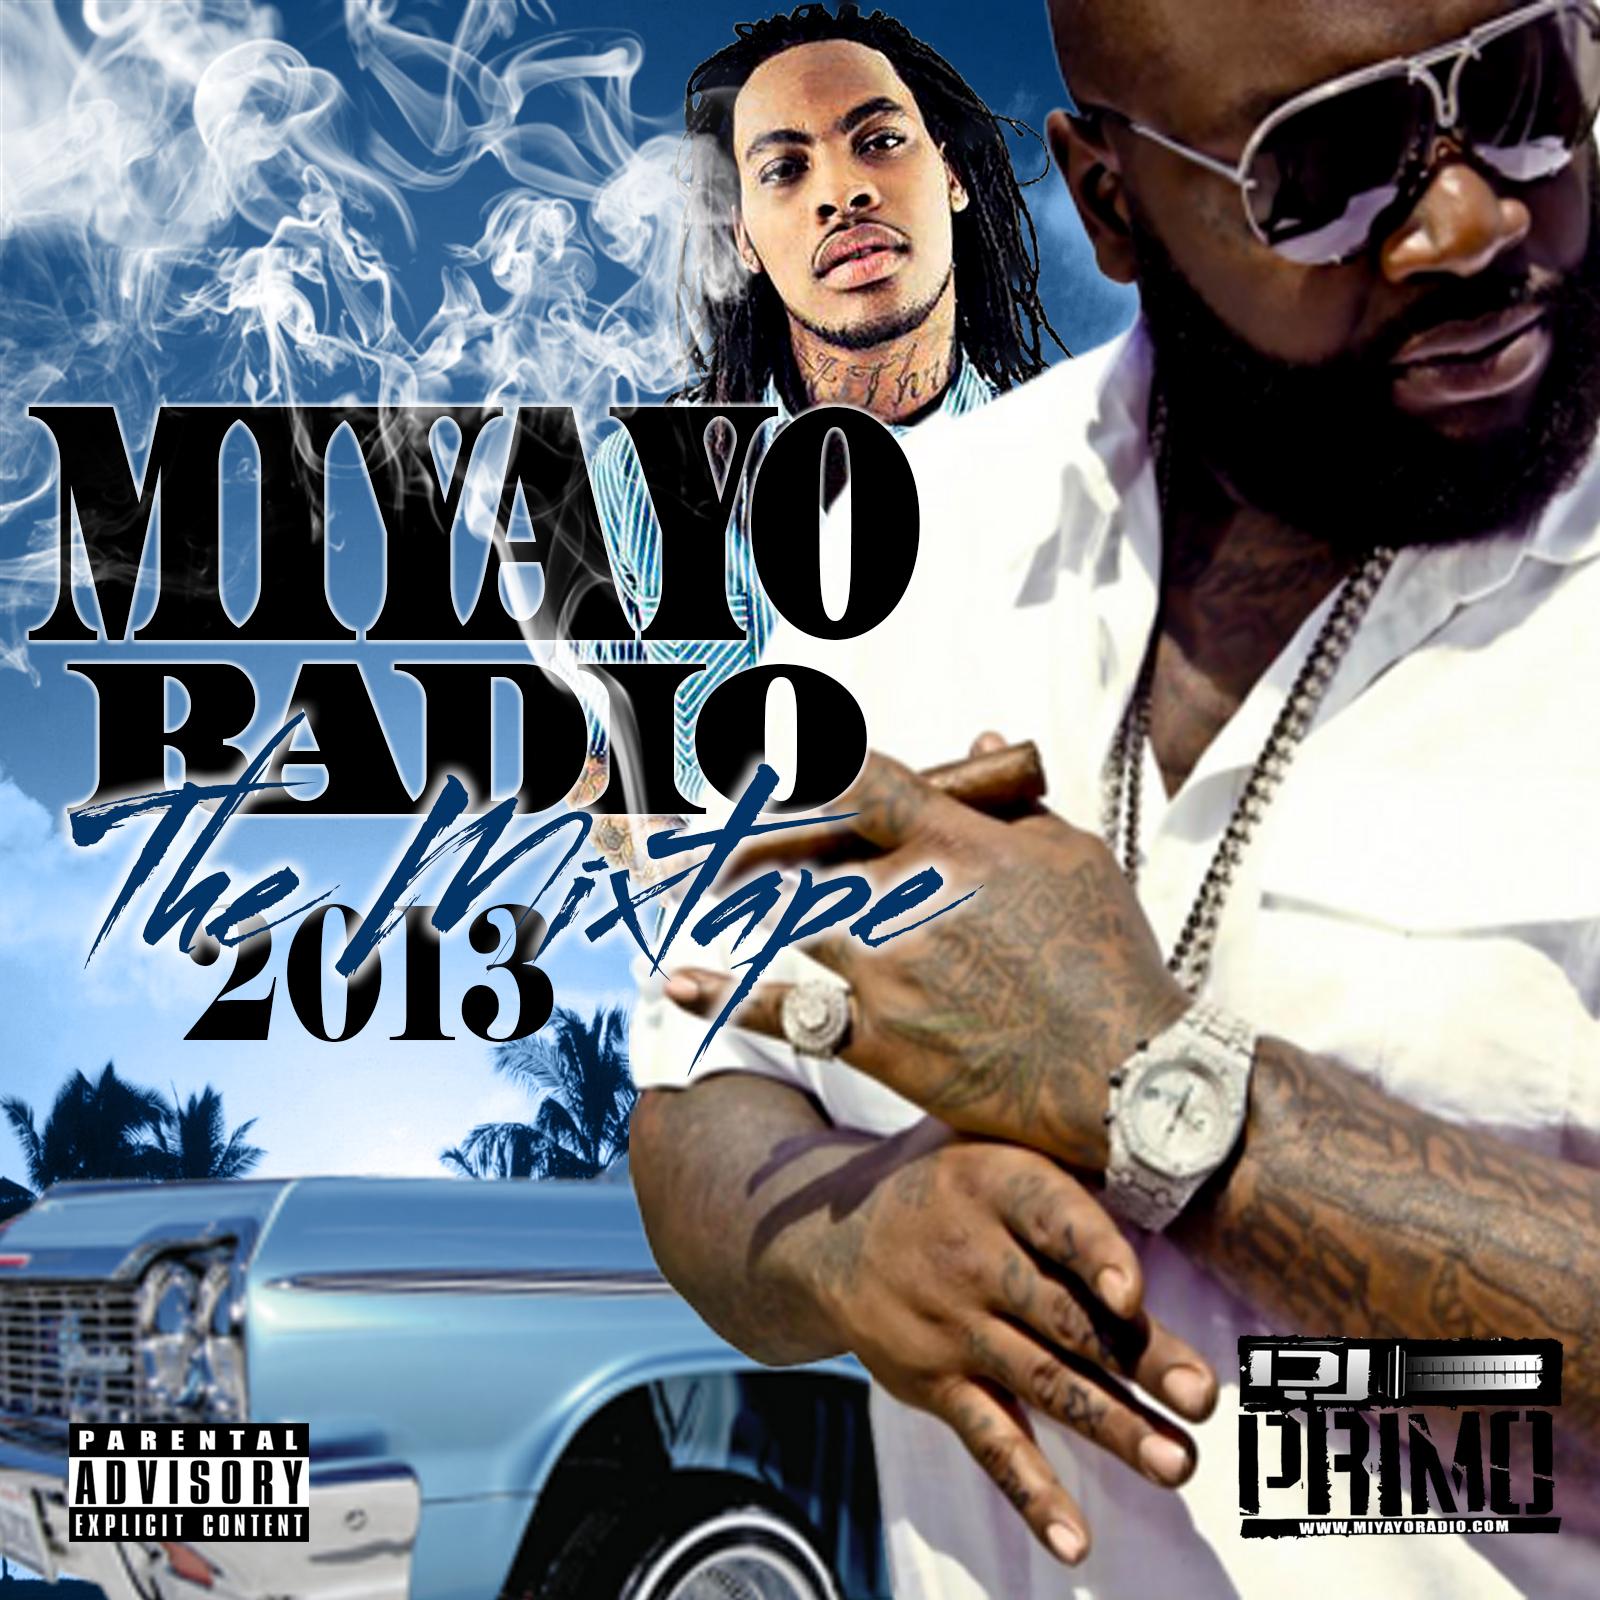 dj primo miyayo mixtape cover front